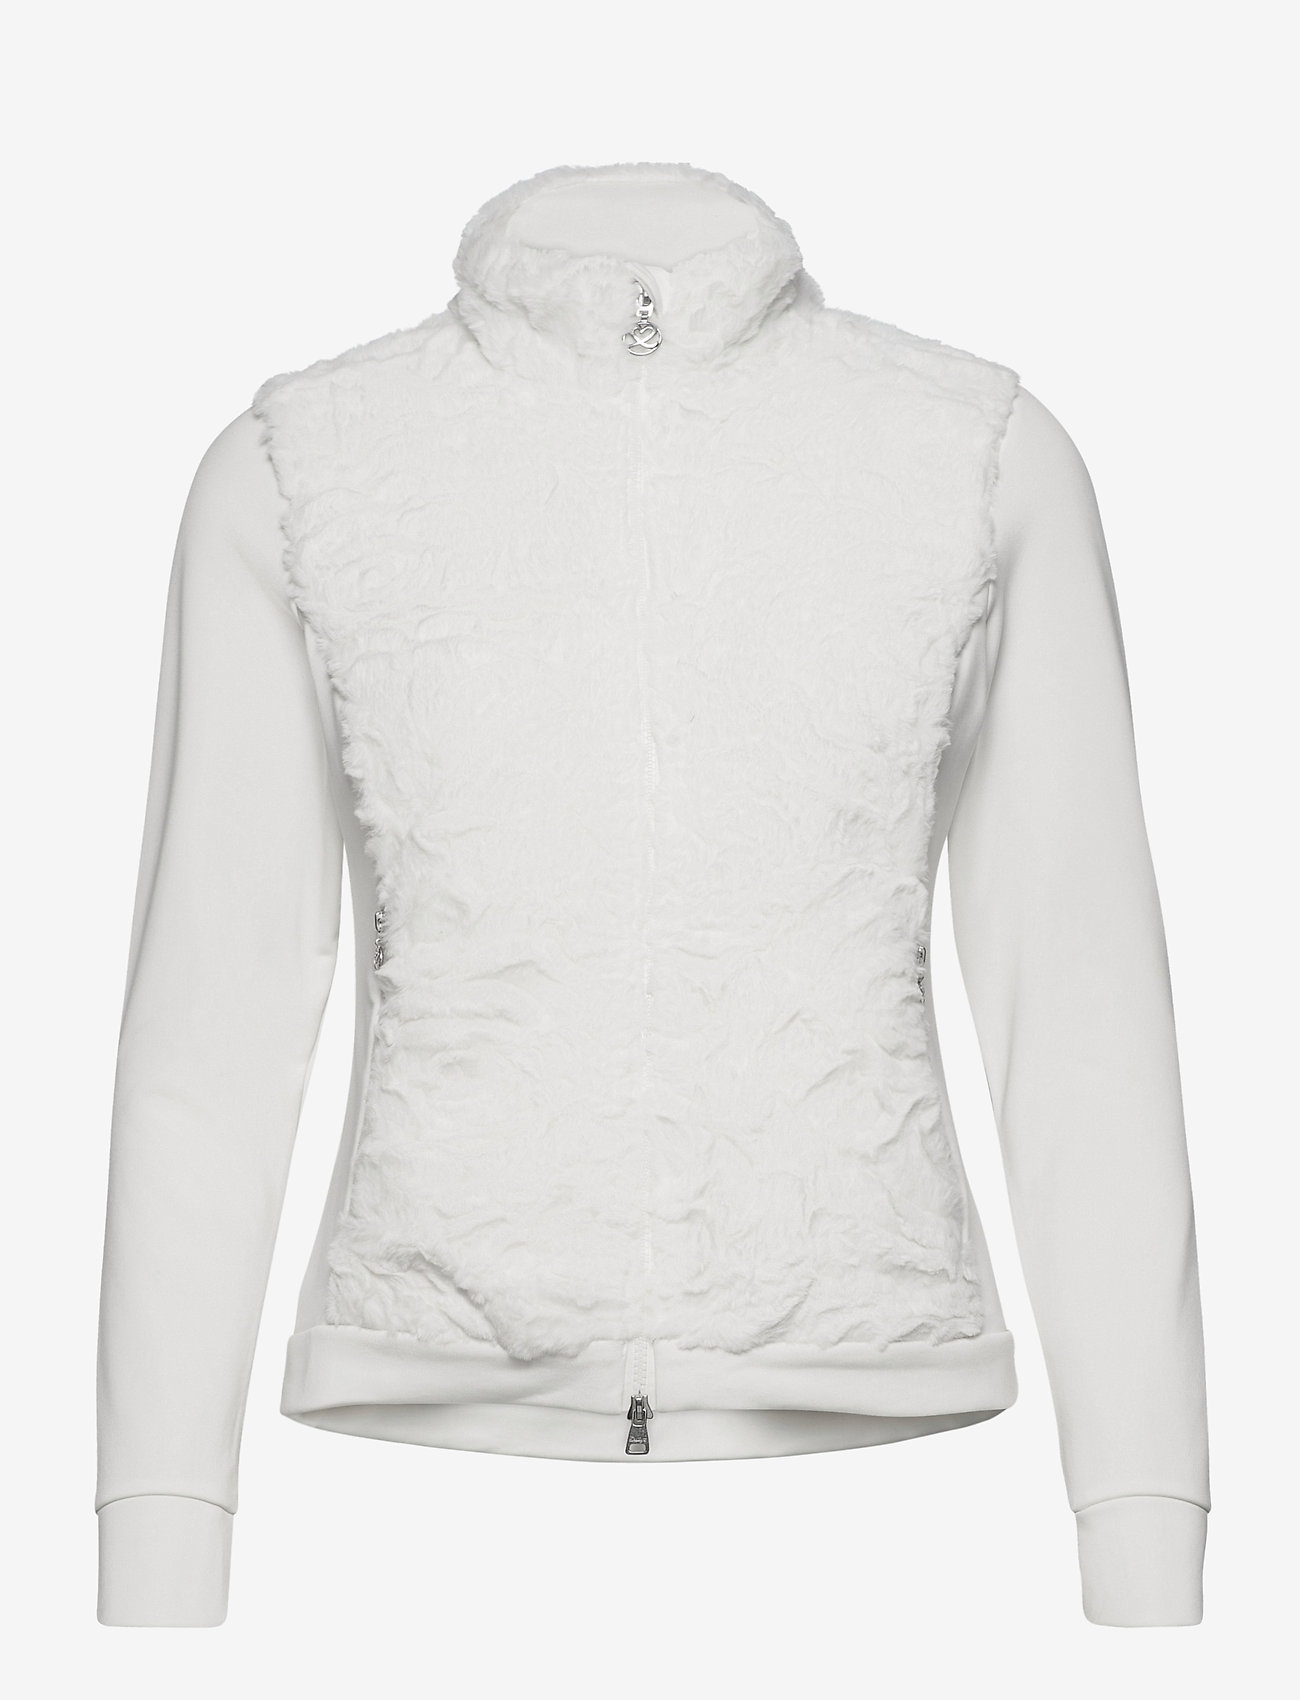 Daily Sports - FRANCES JACKET - golf jackets - ivory - 1